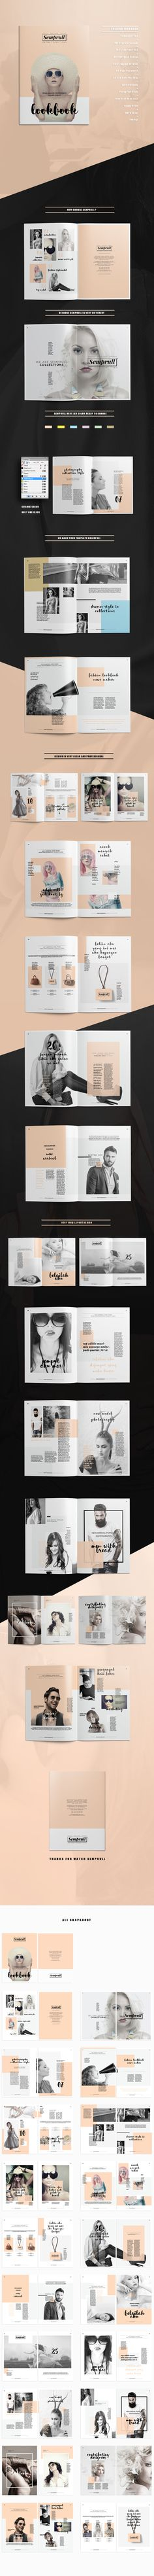 booklet, brochure, business brochure, catalog, clean, creative, delicate, design, elegant, fashion, indie, lookbook, mag, magazine, minimal, modern, photobook, photography portfolio, pink, portfolio, project, proposal, resume, rw, simple, spring, style, t…